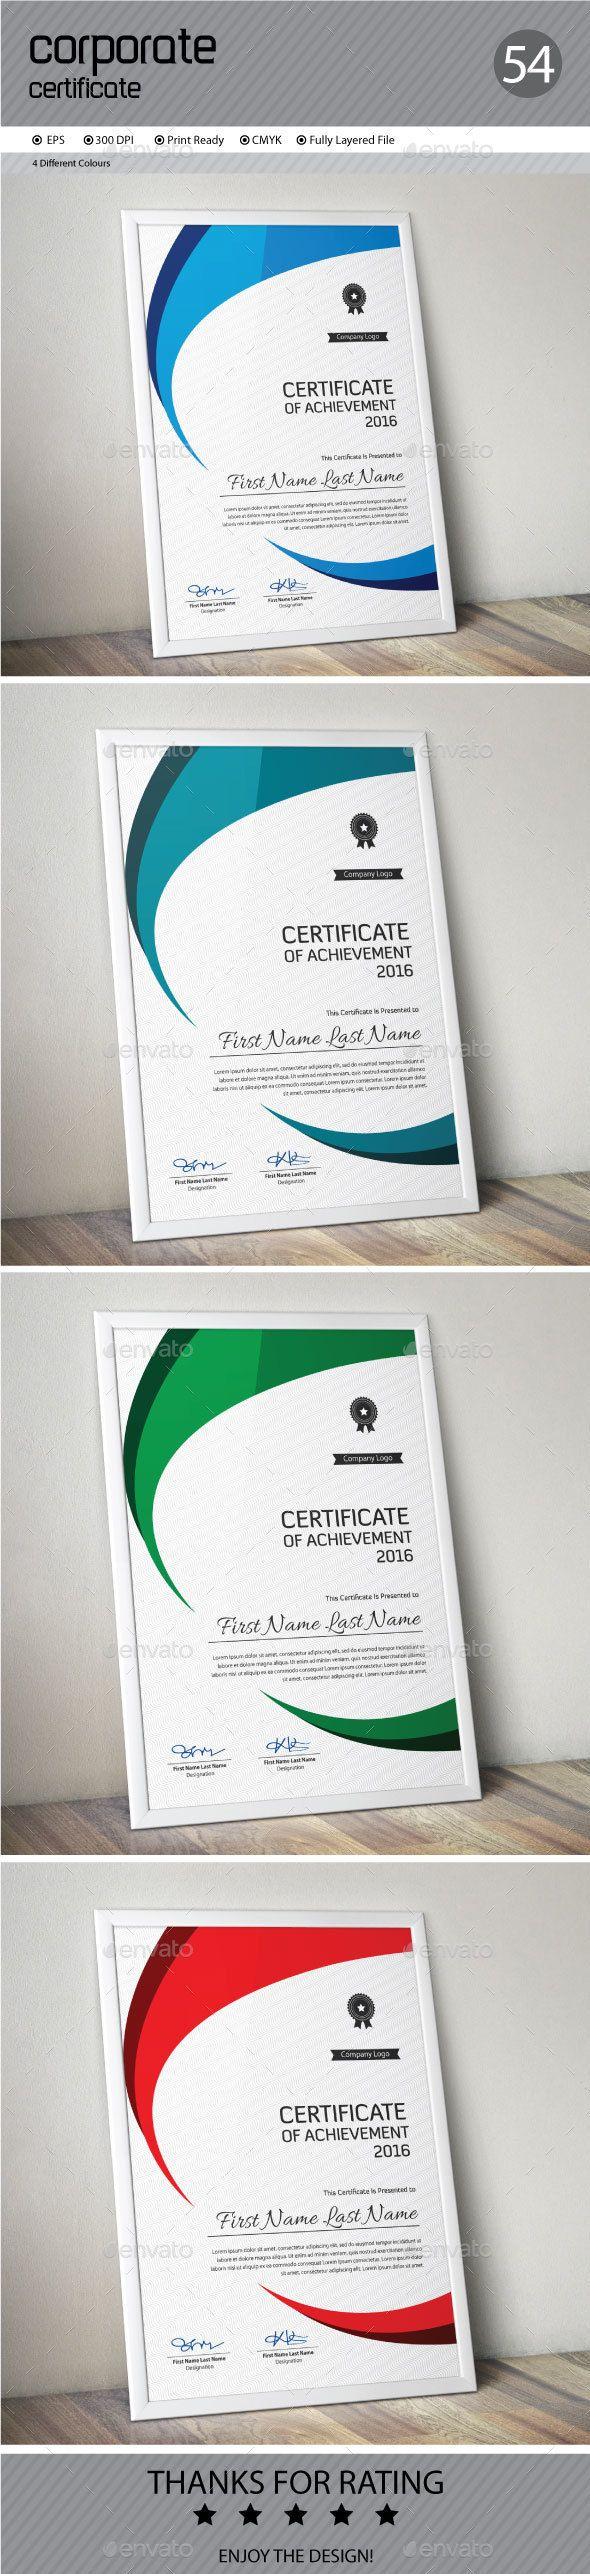 Certificate Template Vector EPS. Download here: http://graphicriver.net/item/certificate/14600876?ref=ksioks